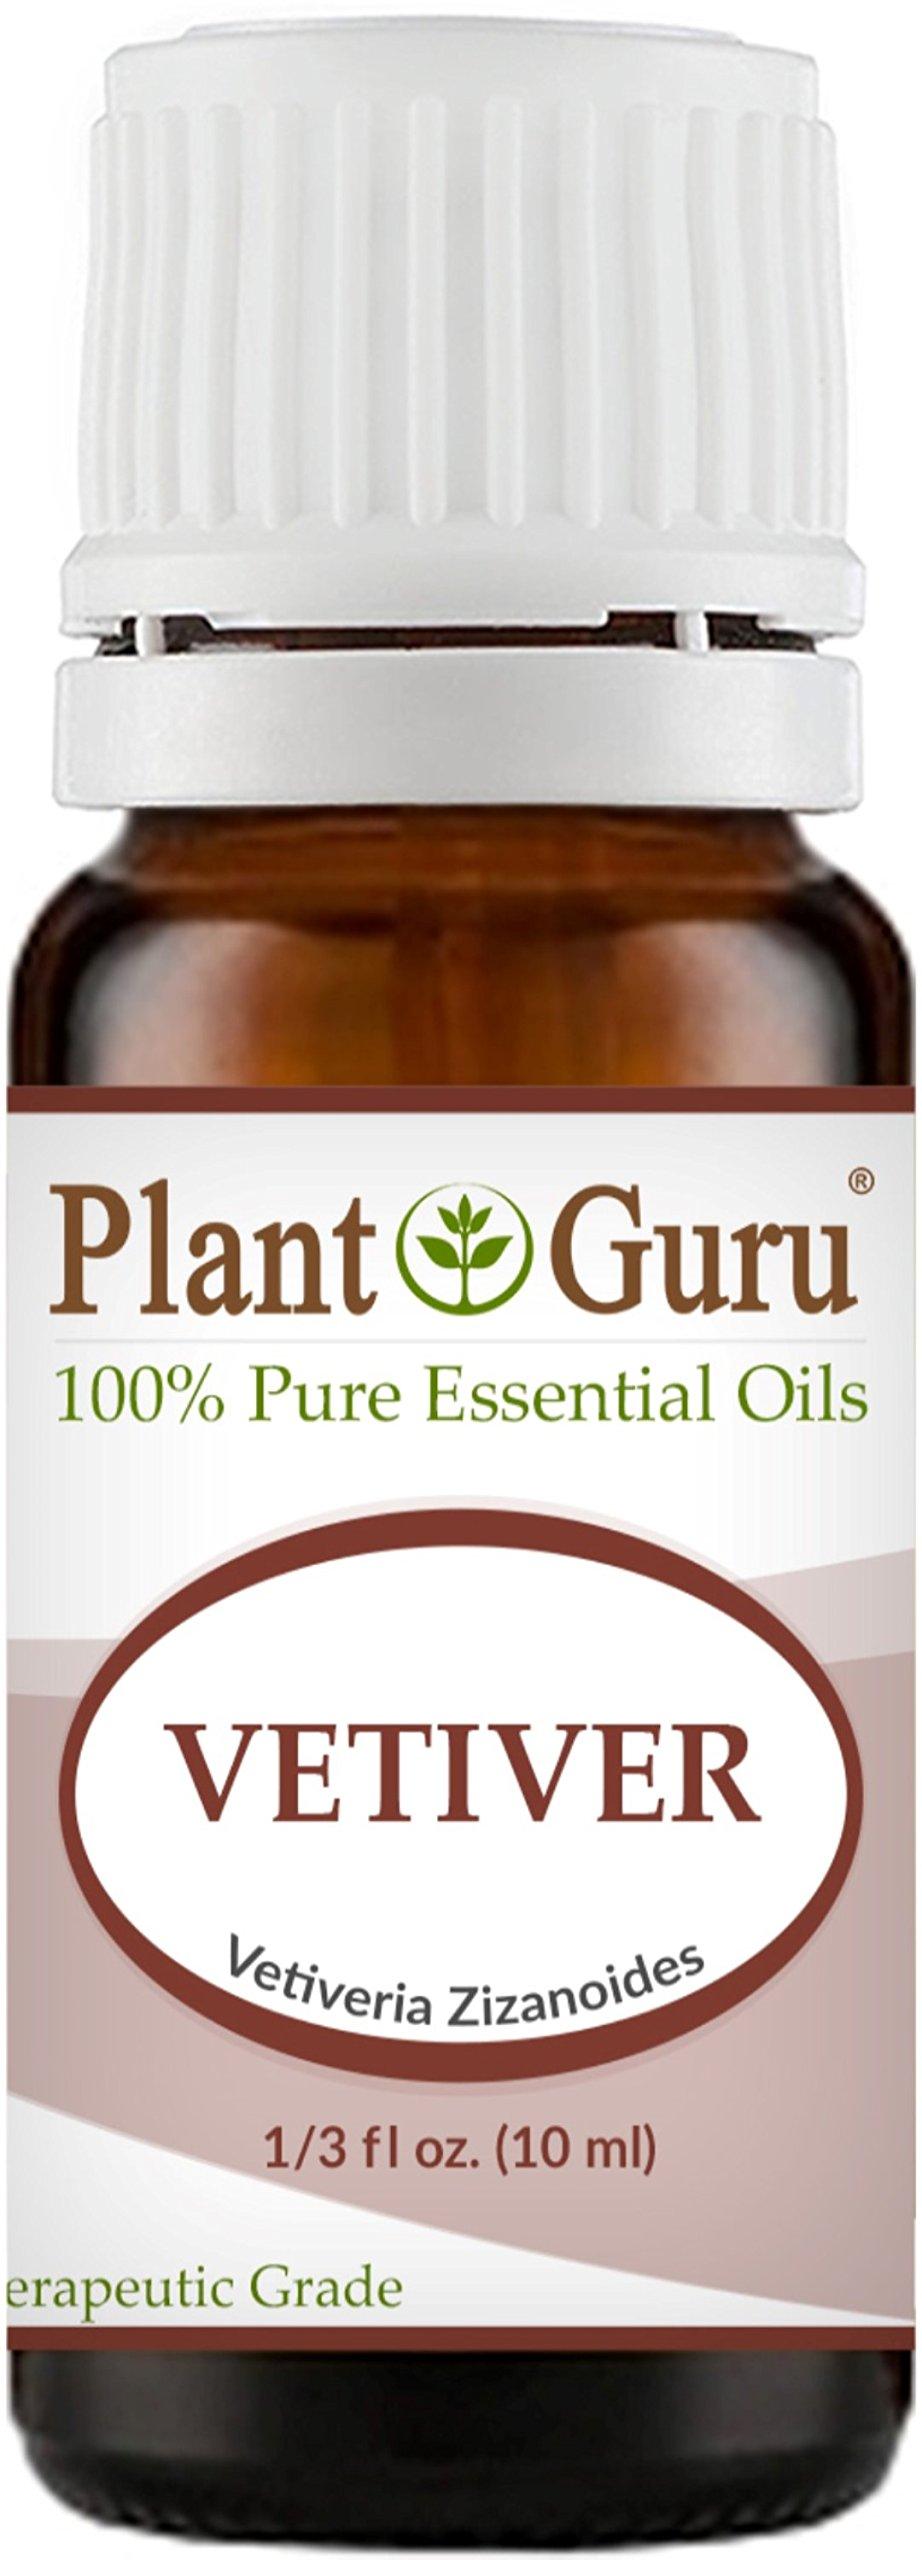 Vetiver Essential Oil 10 ml 100% Pure Undiluted Therapeutic Grade.